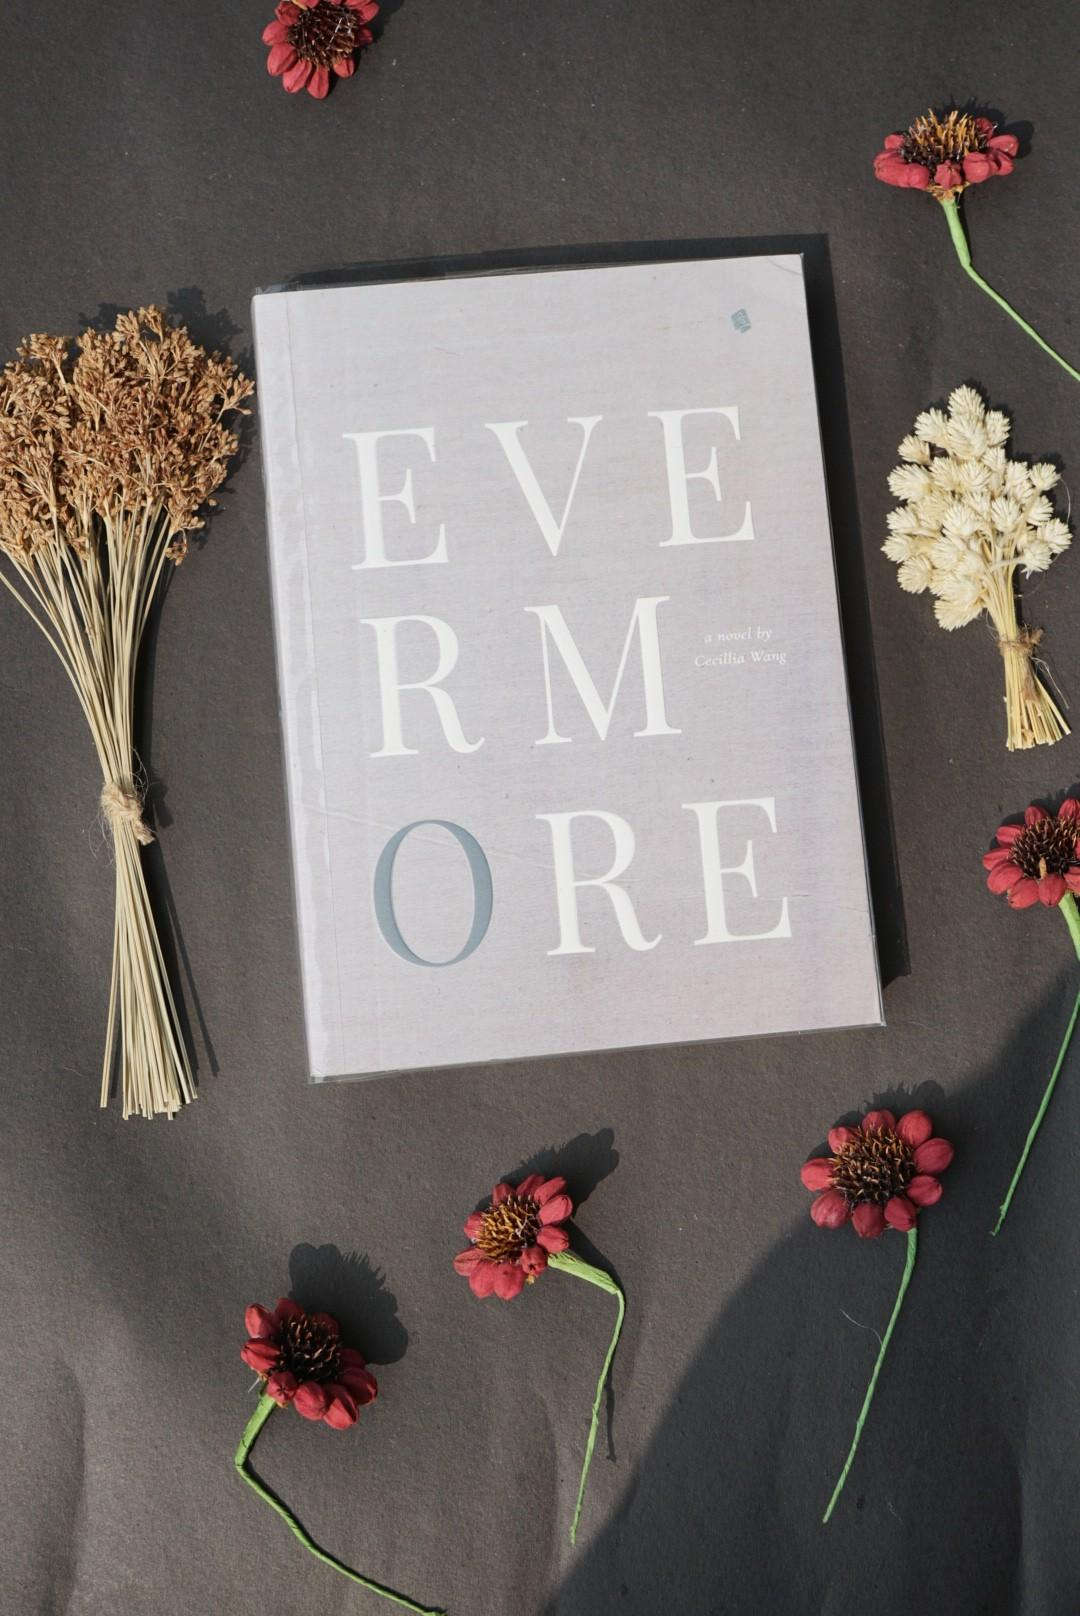 Novel Evermore karya Cecillia Wang (original)